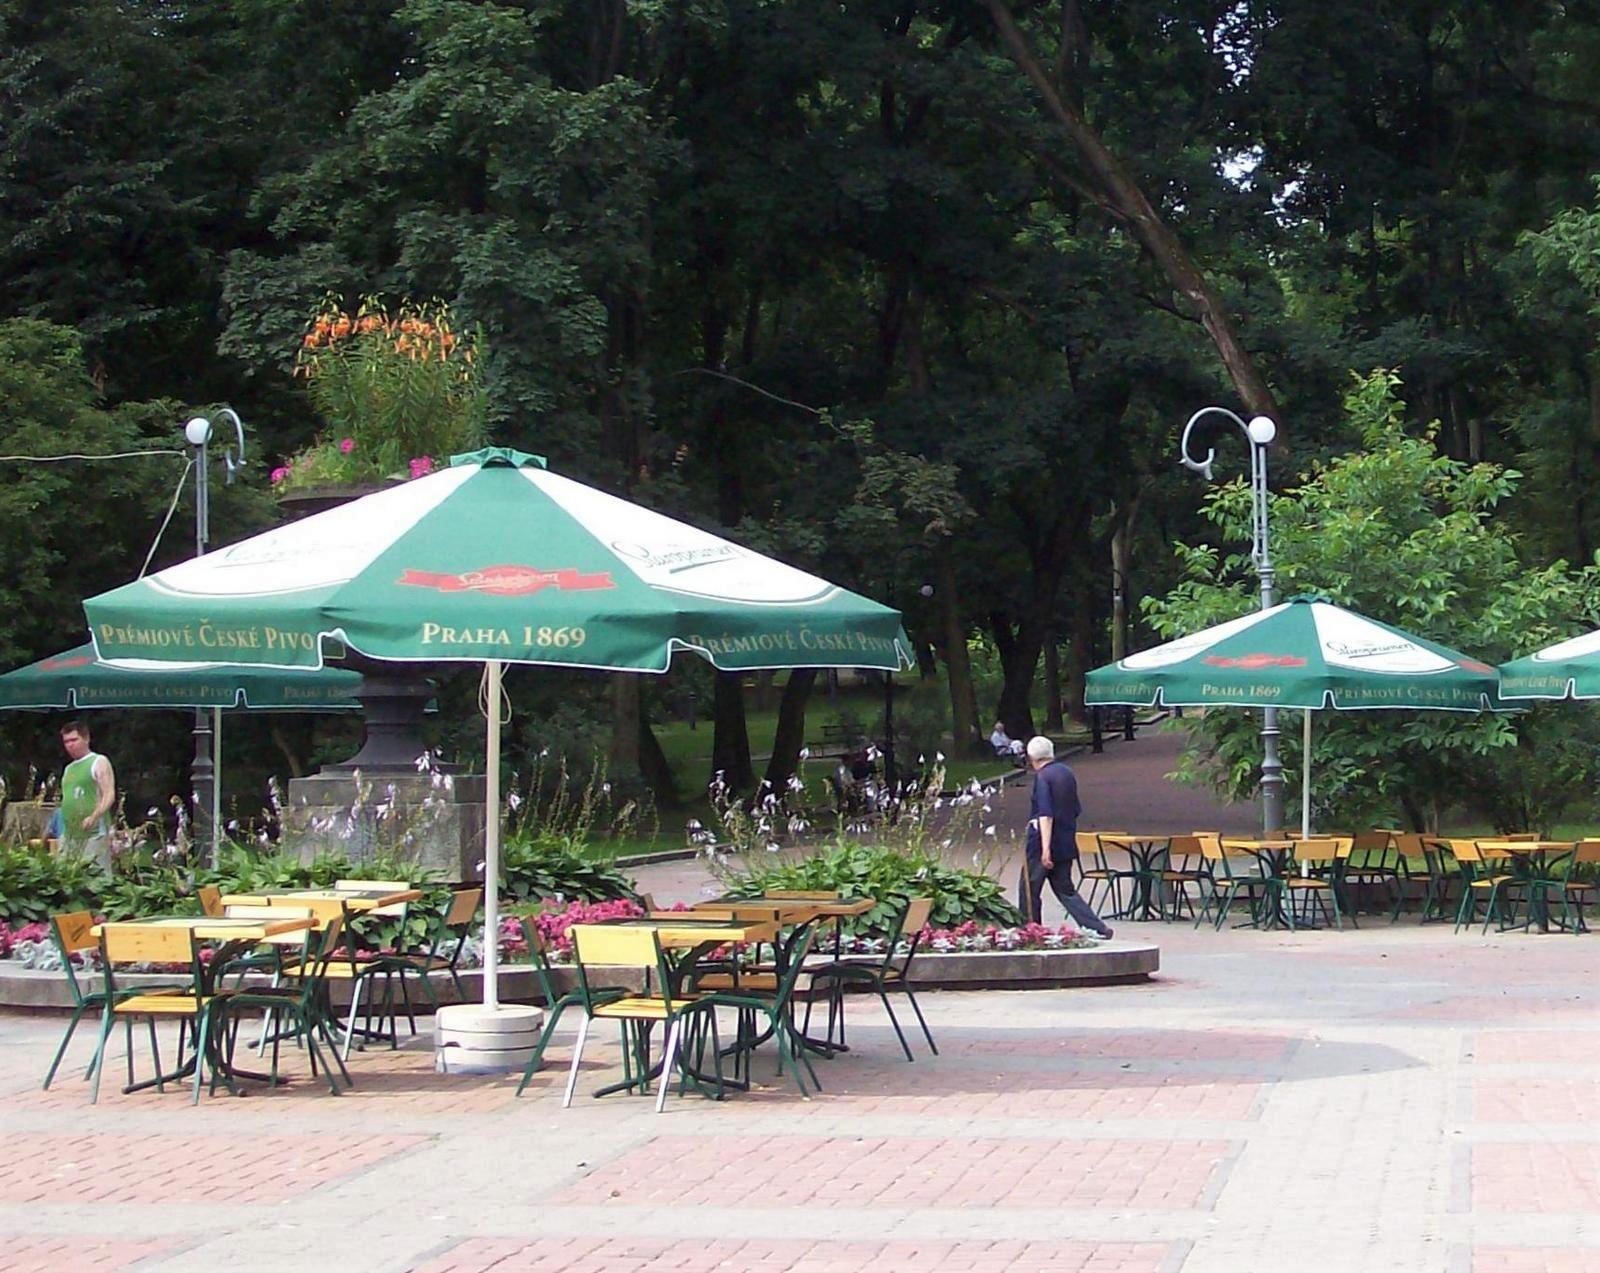 Iwan-Franko-Park Lemberg